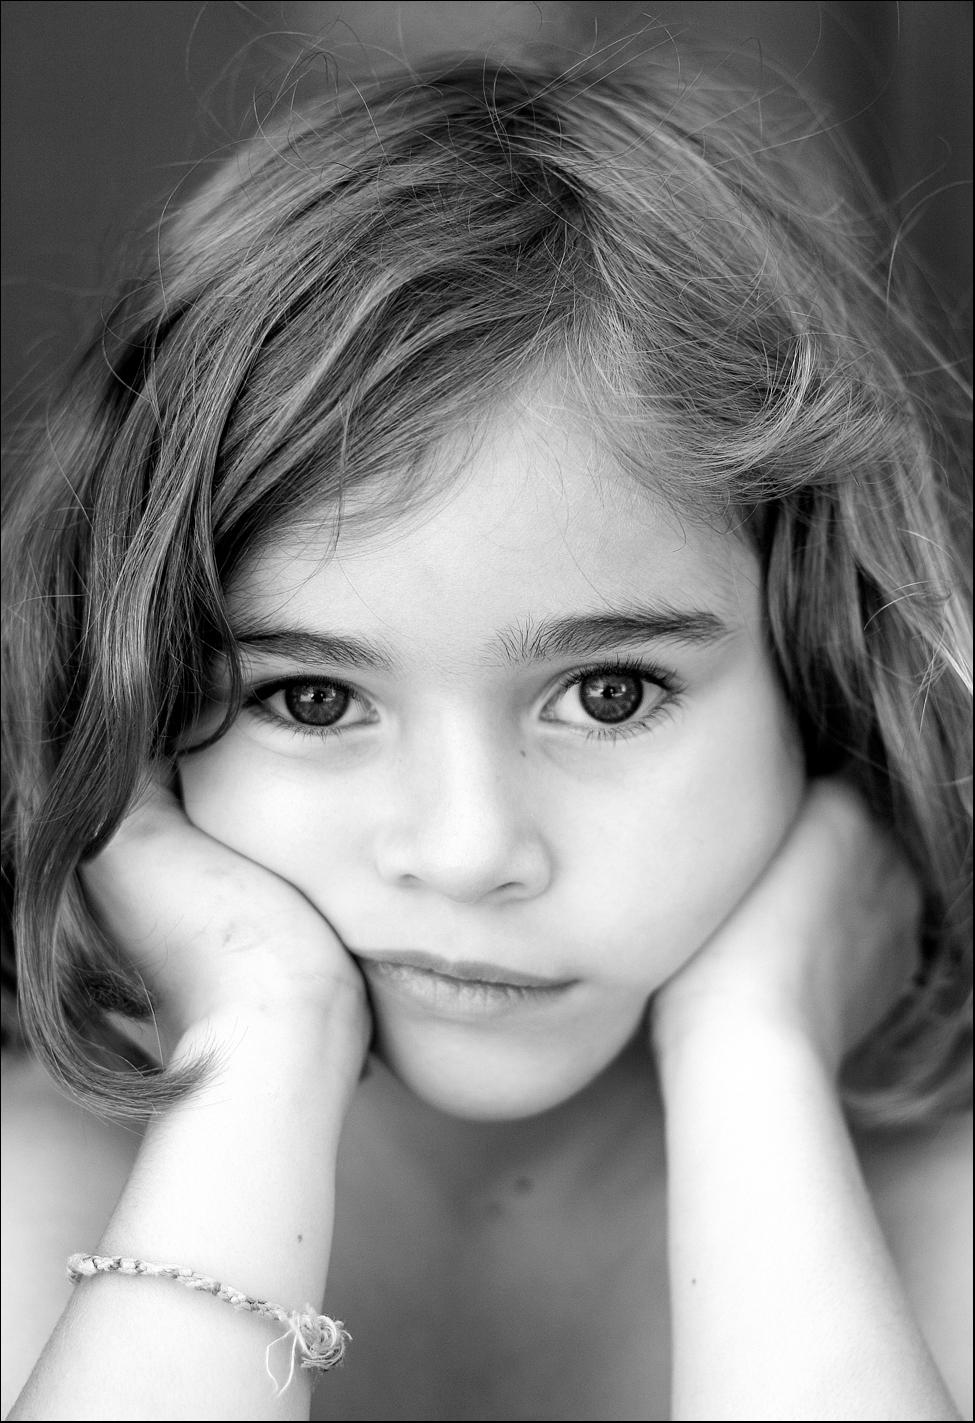 بالصور صور بنت زعلانه , صور حزينه لبنت تبكي 871 7